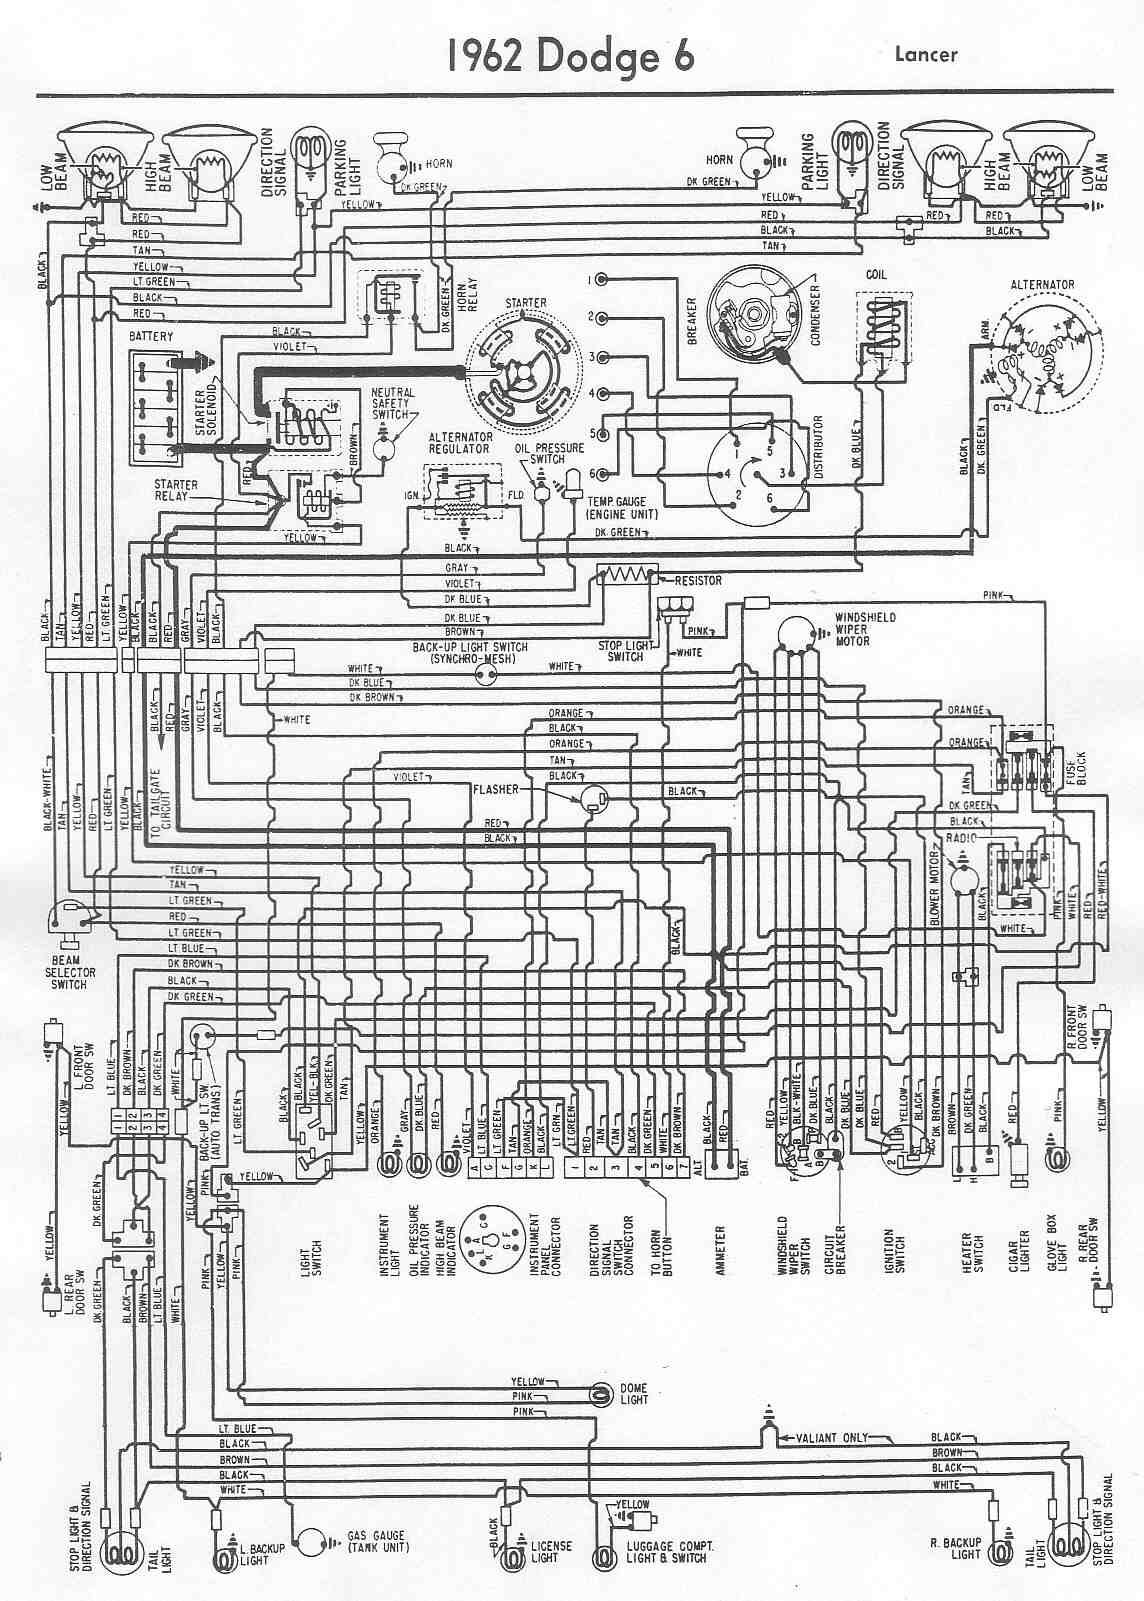 electrical wiring diagram of 1962 dodge 6 lancer?t=1520179692 dodge car manuals, wiring diagrams pdf & fault codes